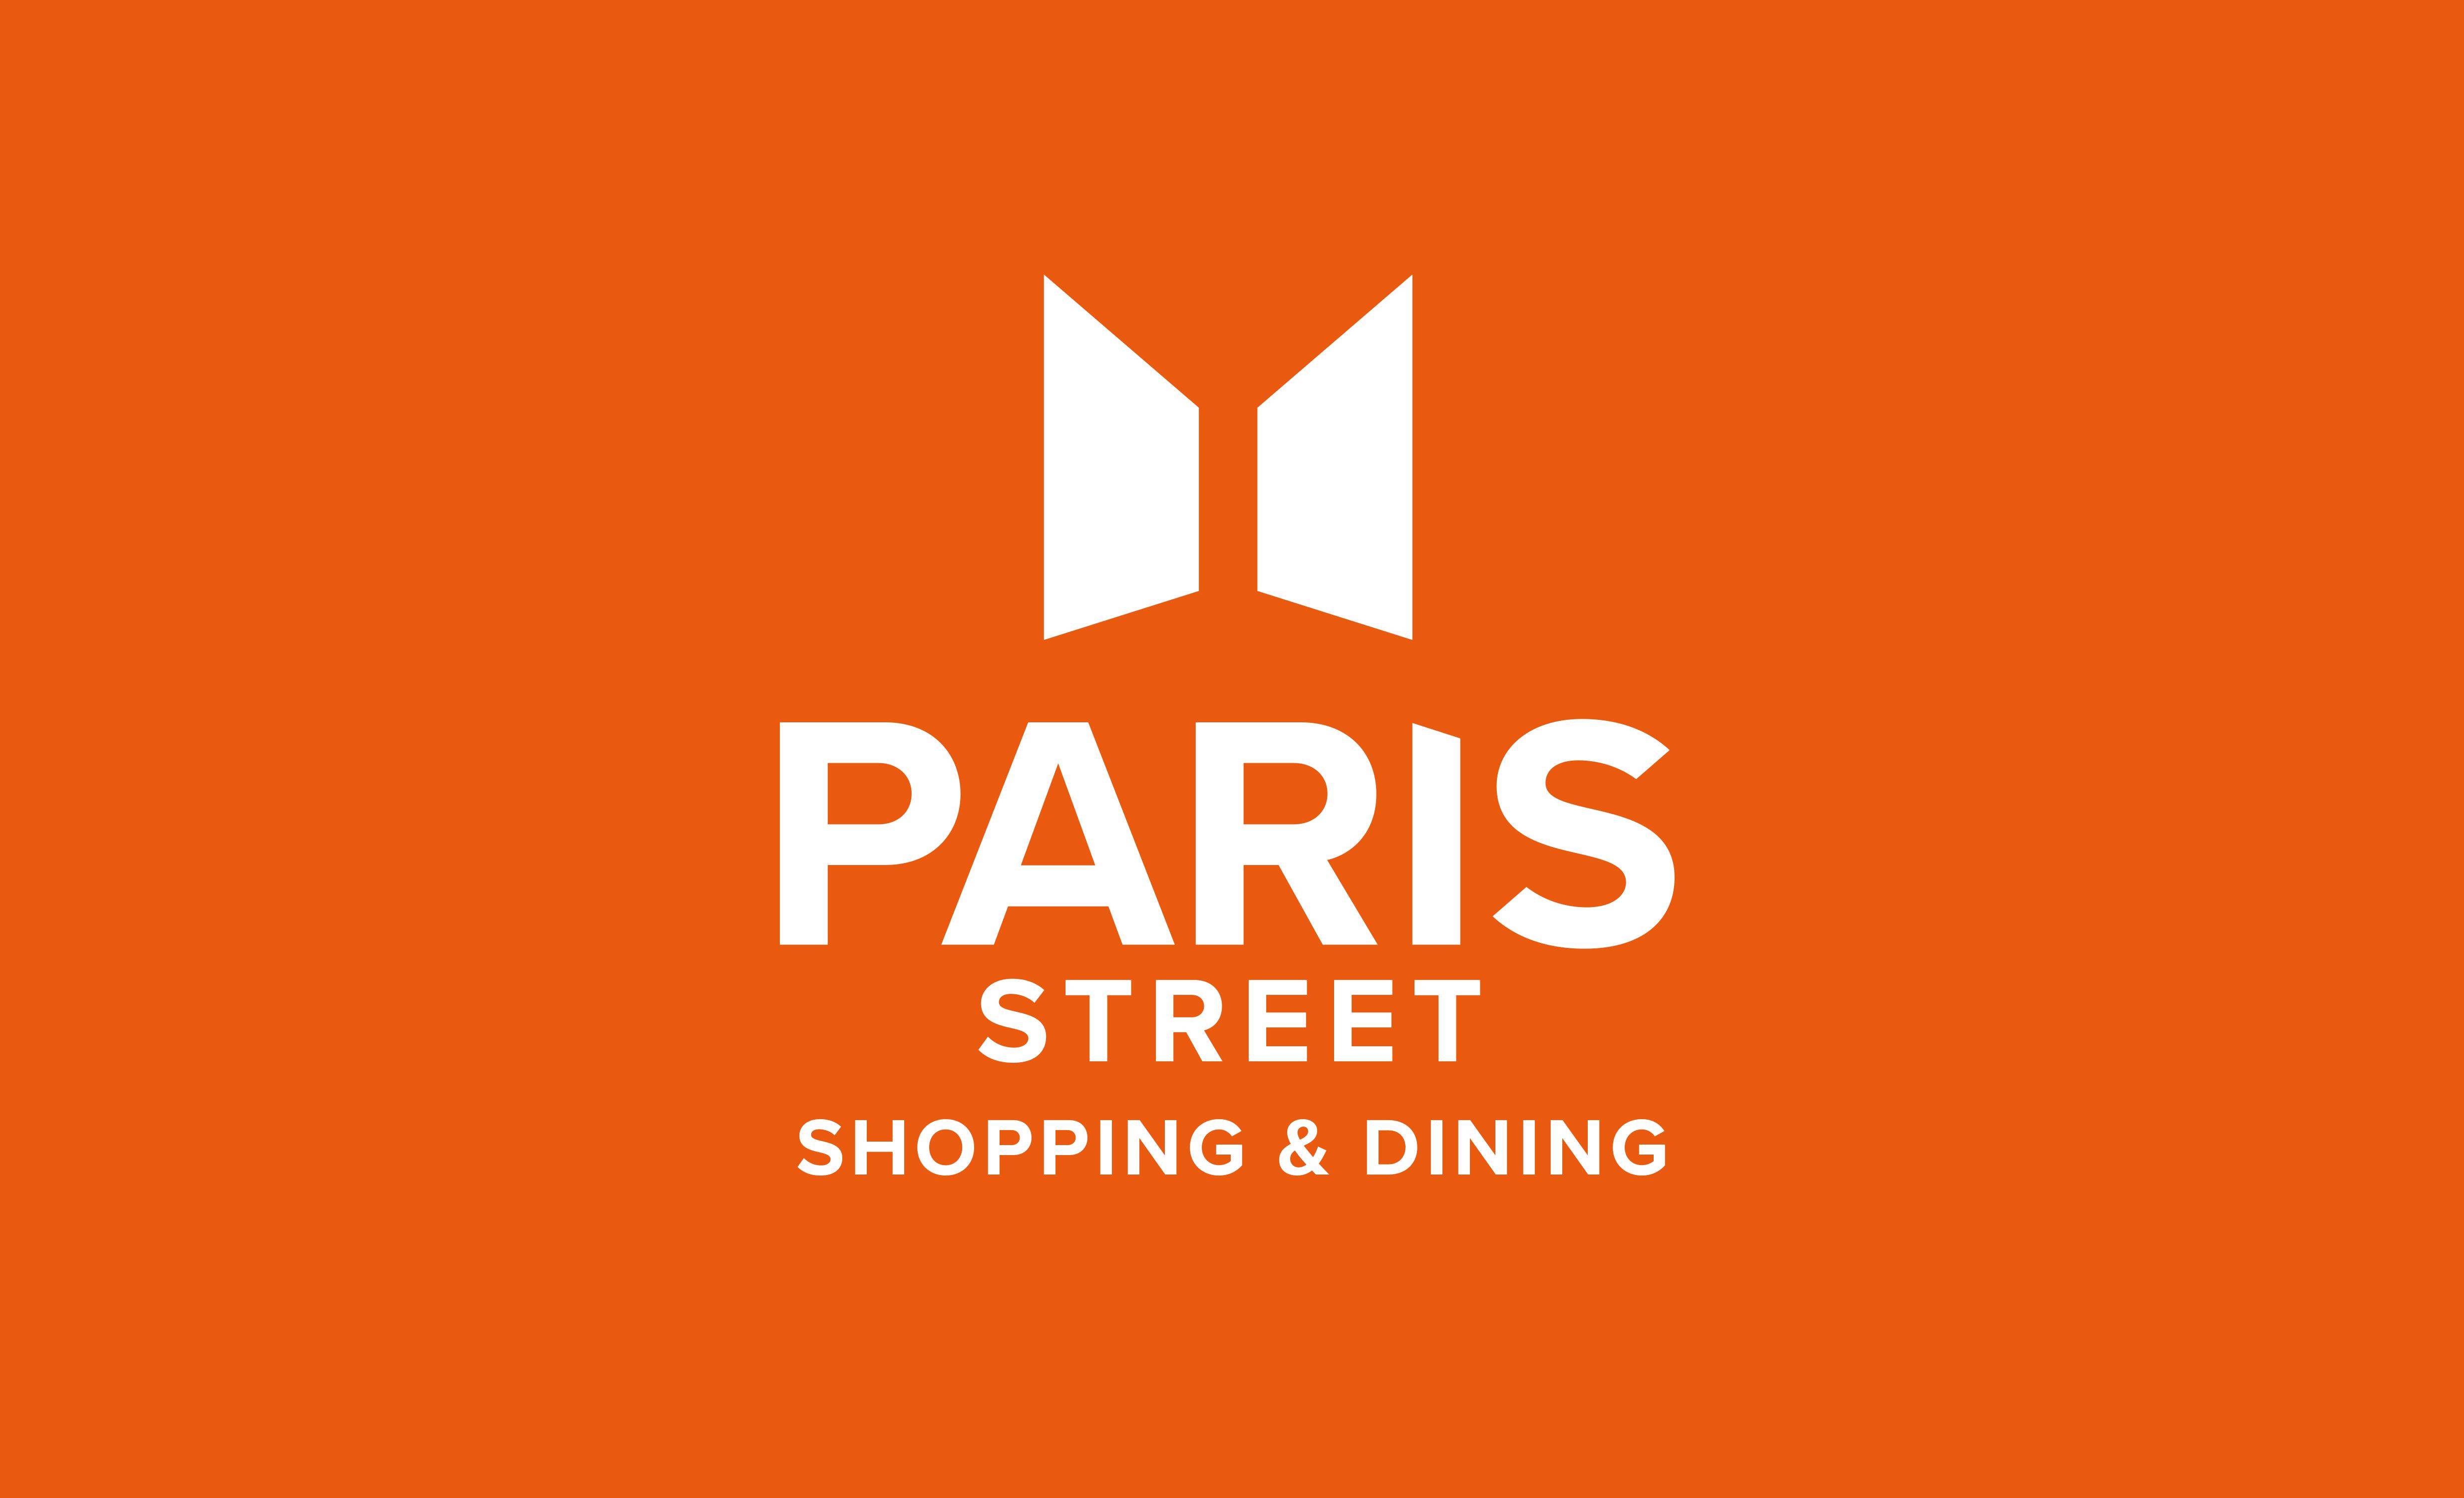 paris street logo